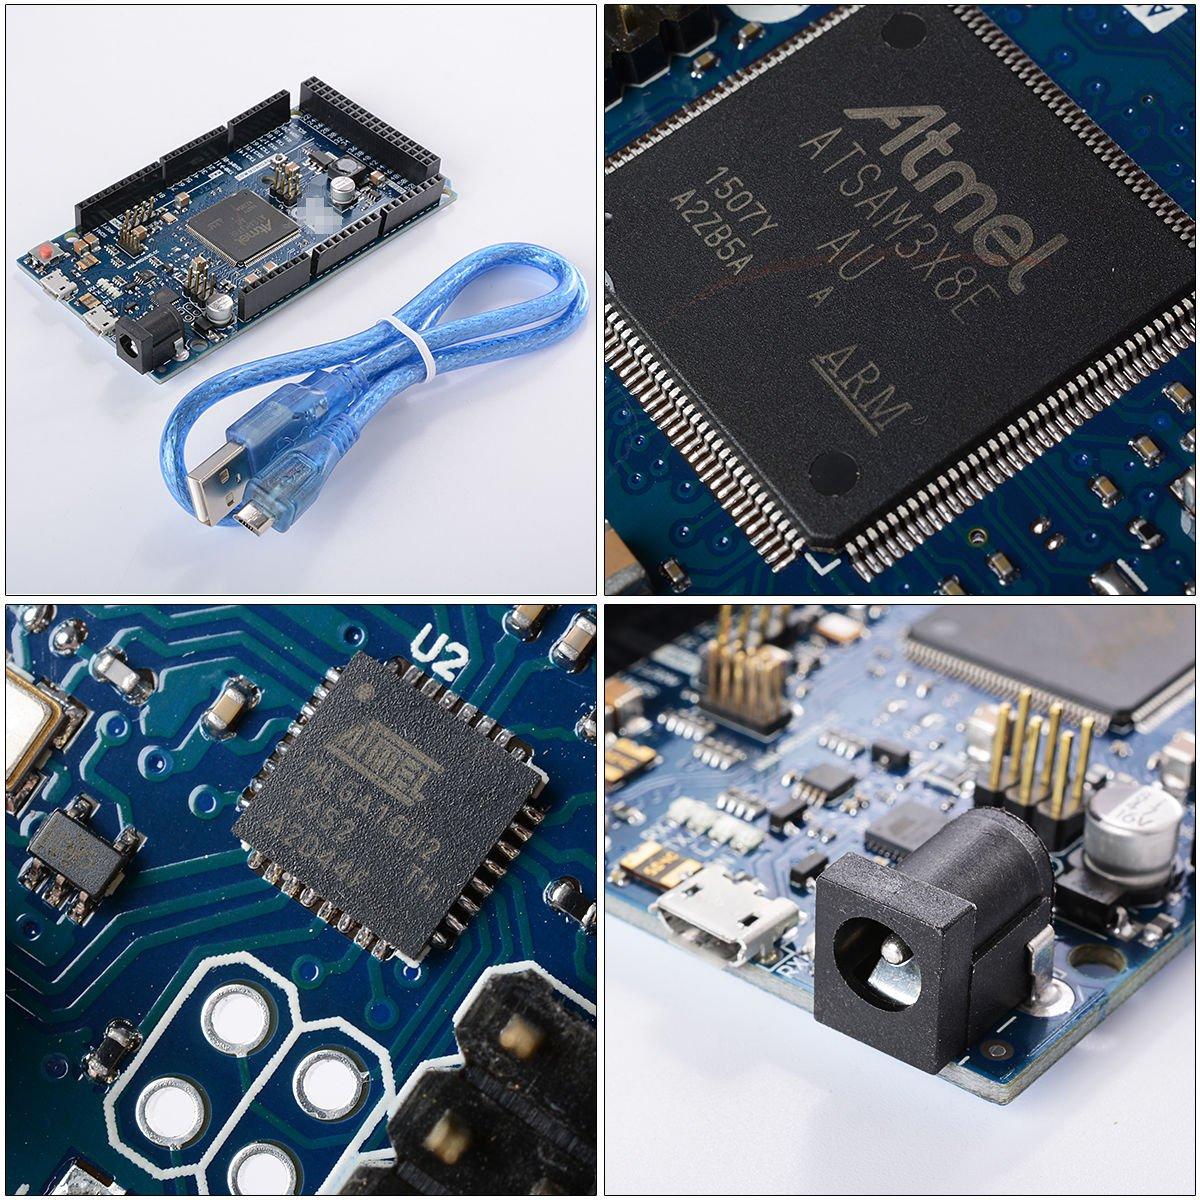 DUE R3 Board SAM3X8E 32-bit ARM Cortex-M3 And Arduino Compatable USB